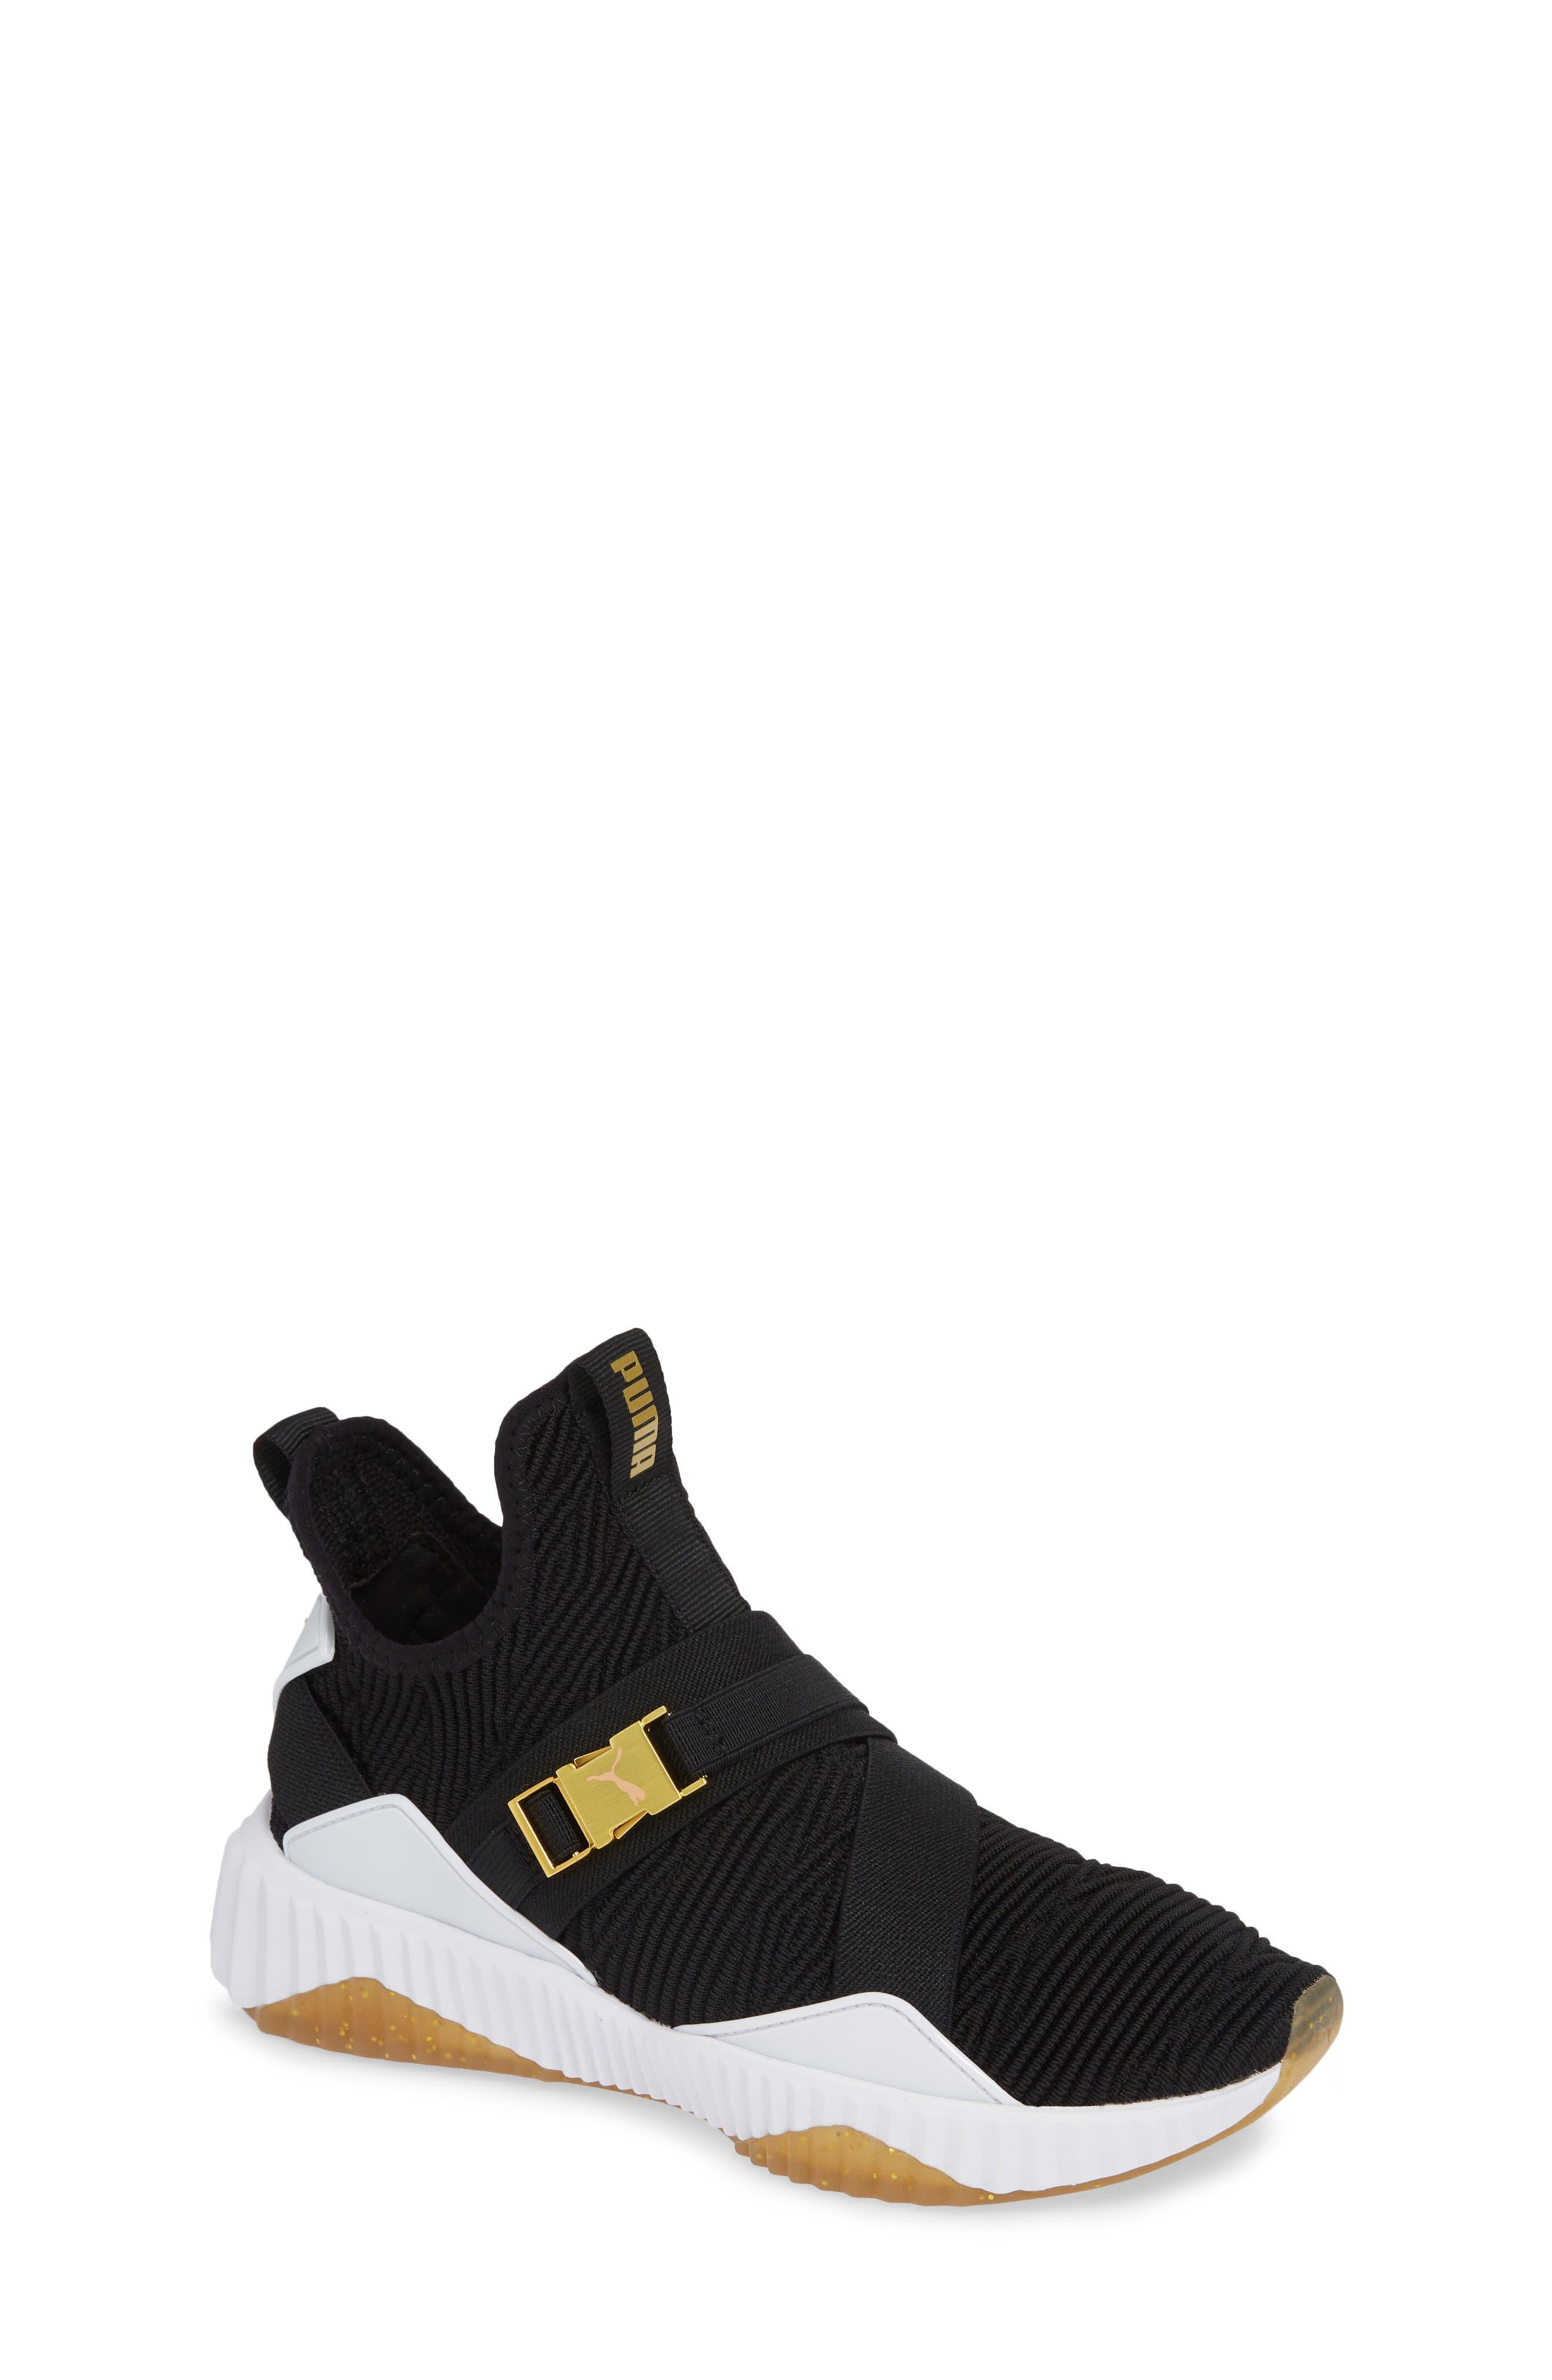 PUMA Defy Mid Varsity Sneaker, Main, color, BLACK/ METALLIC GOLD